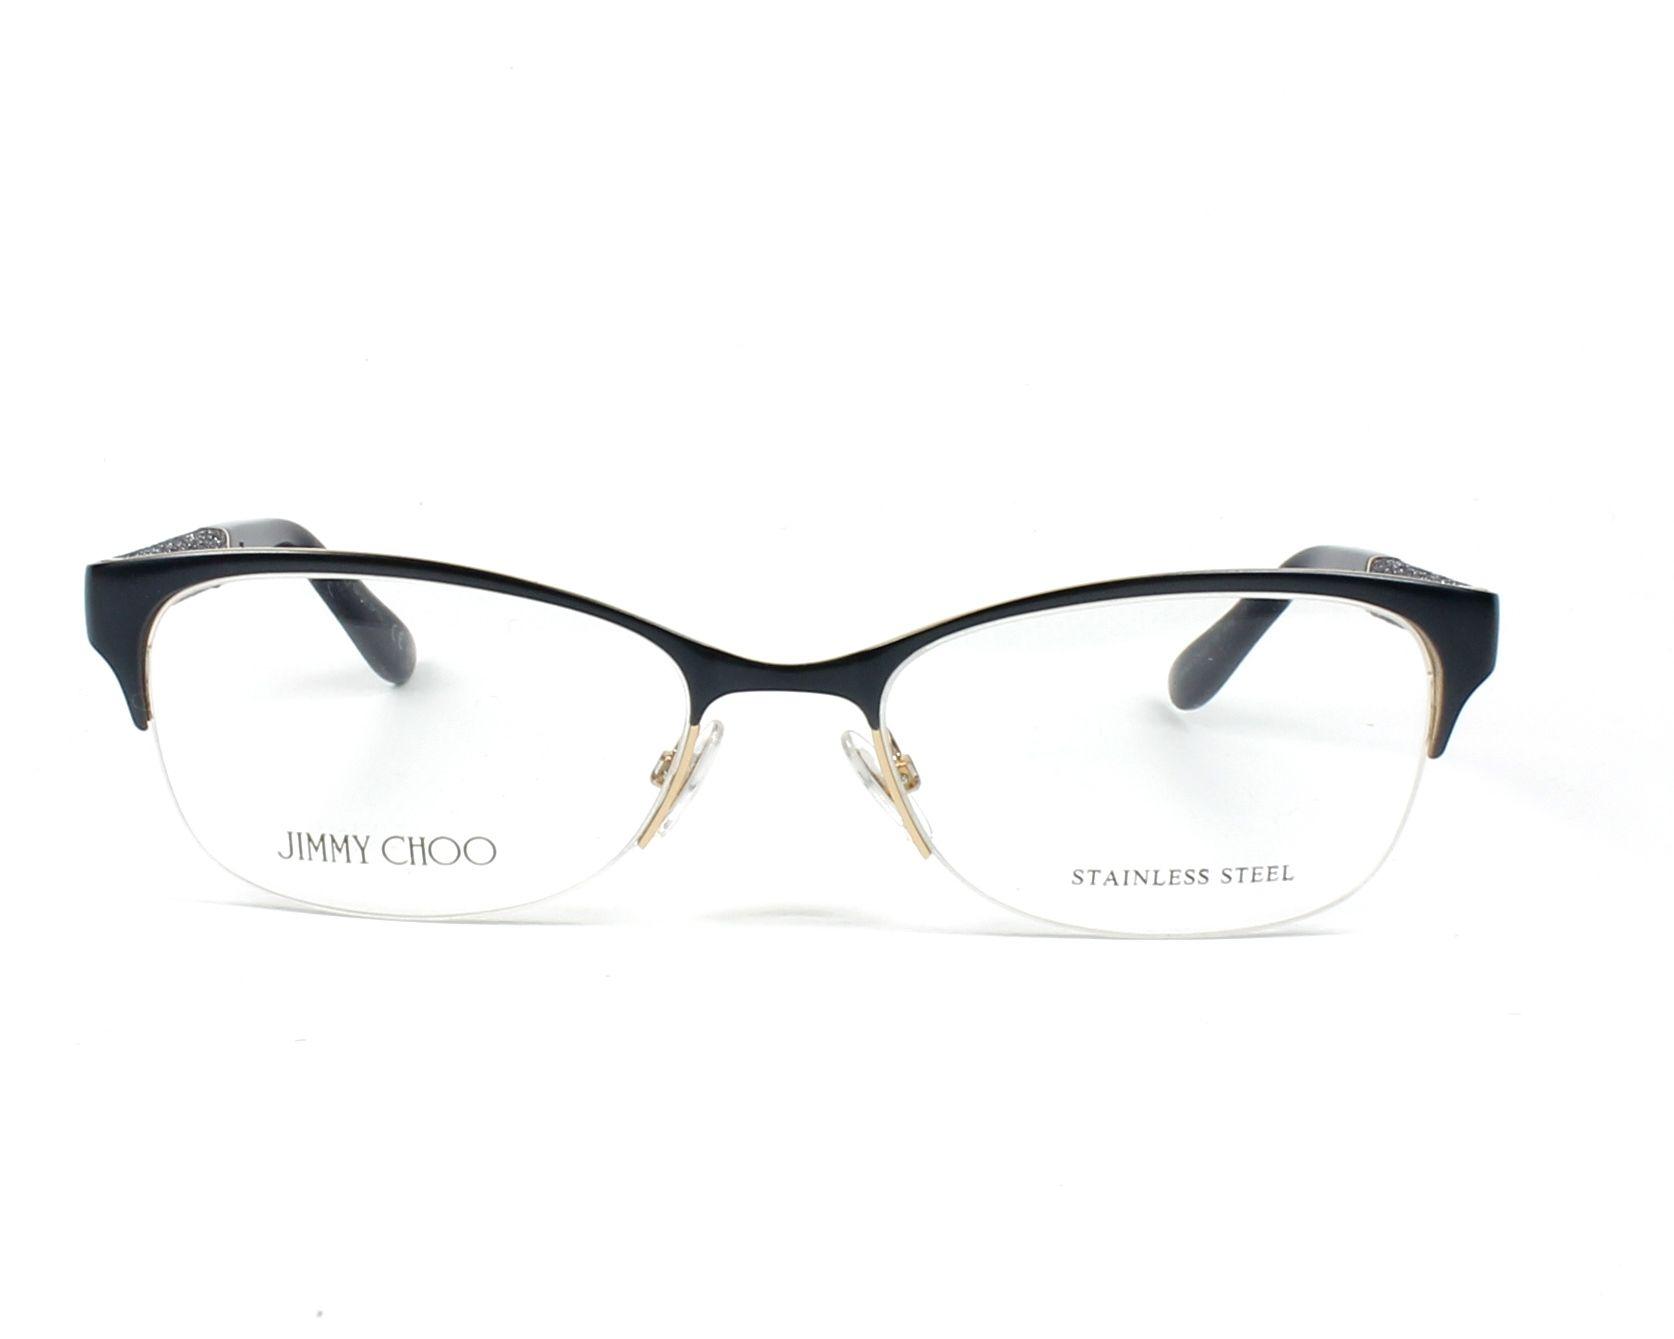 a3f55cb926 eyeglasses Jimmy Choo JC-106 F79 - Blue Grey front view